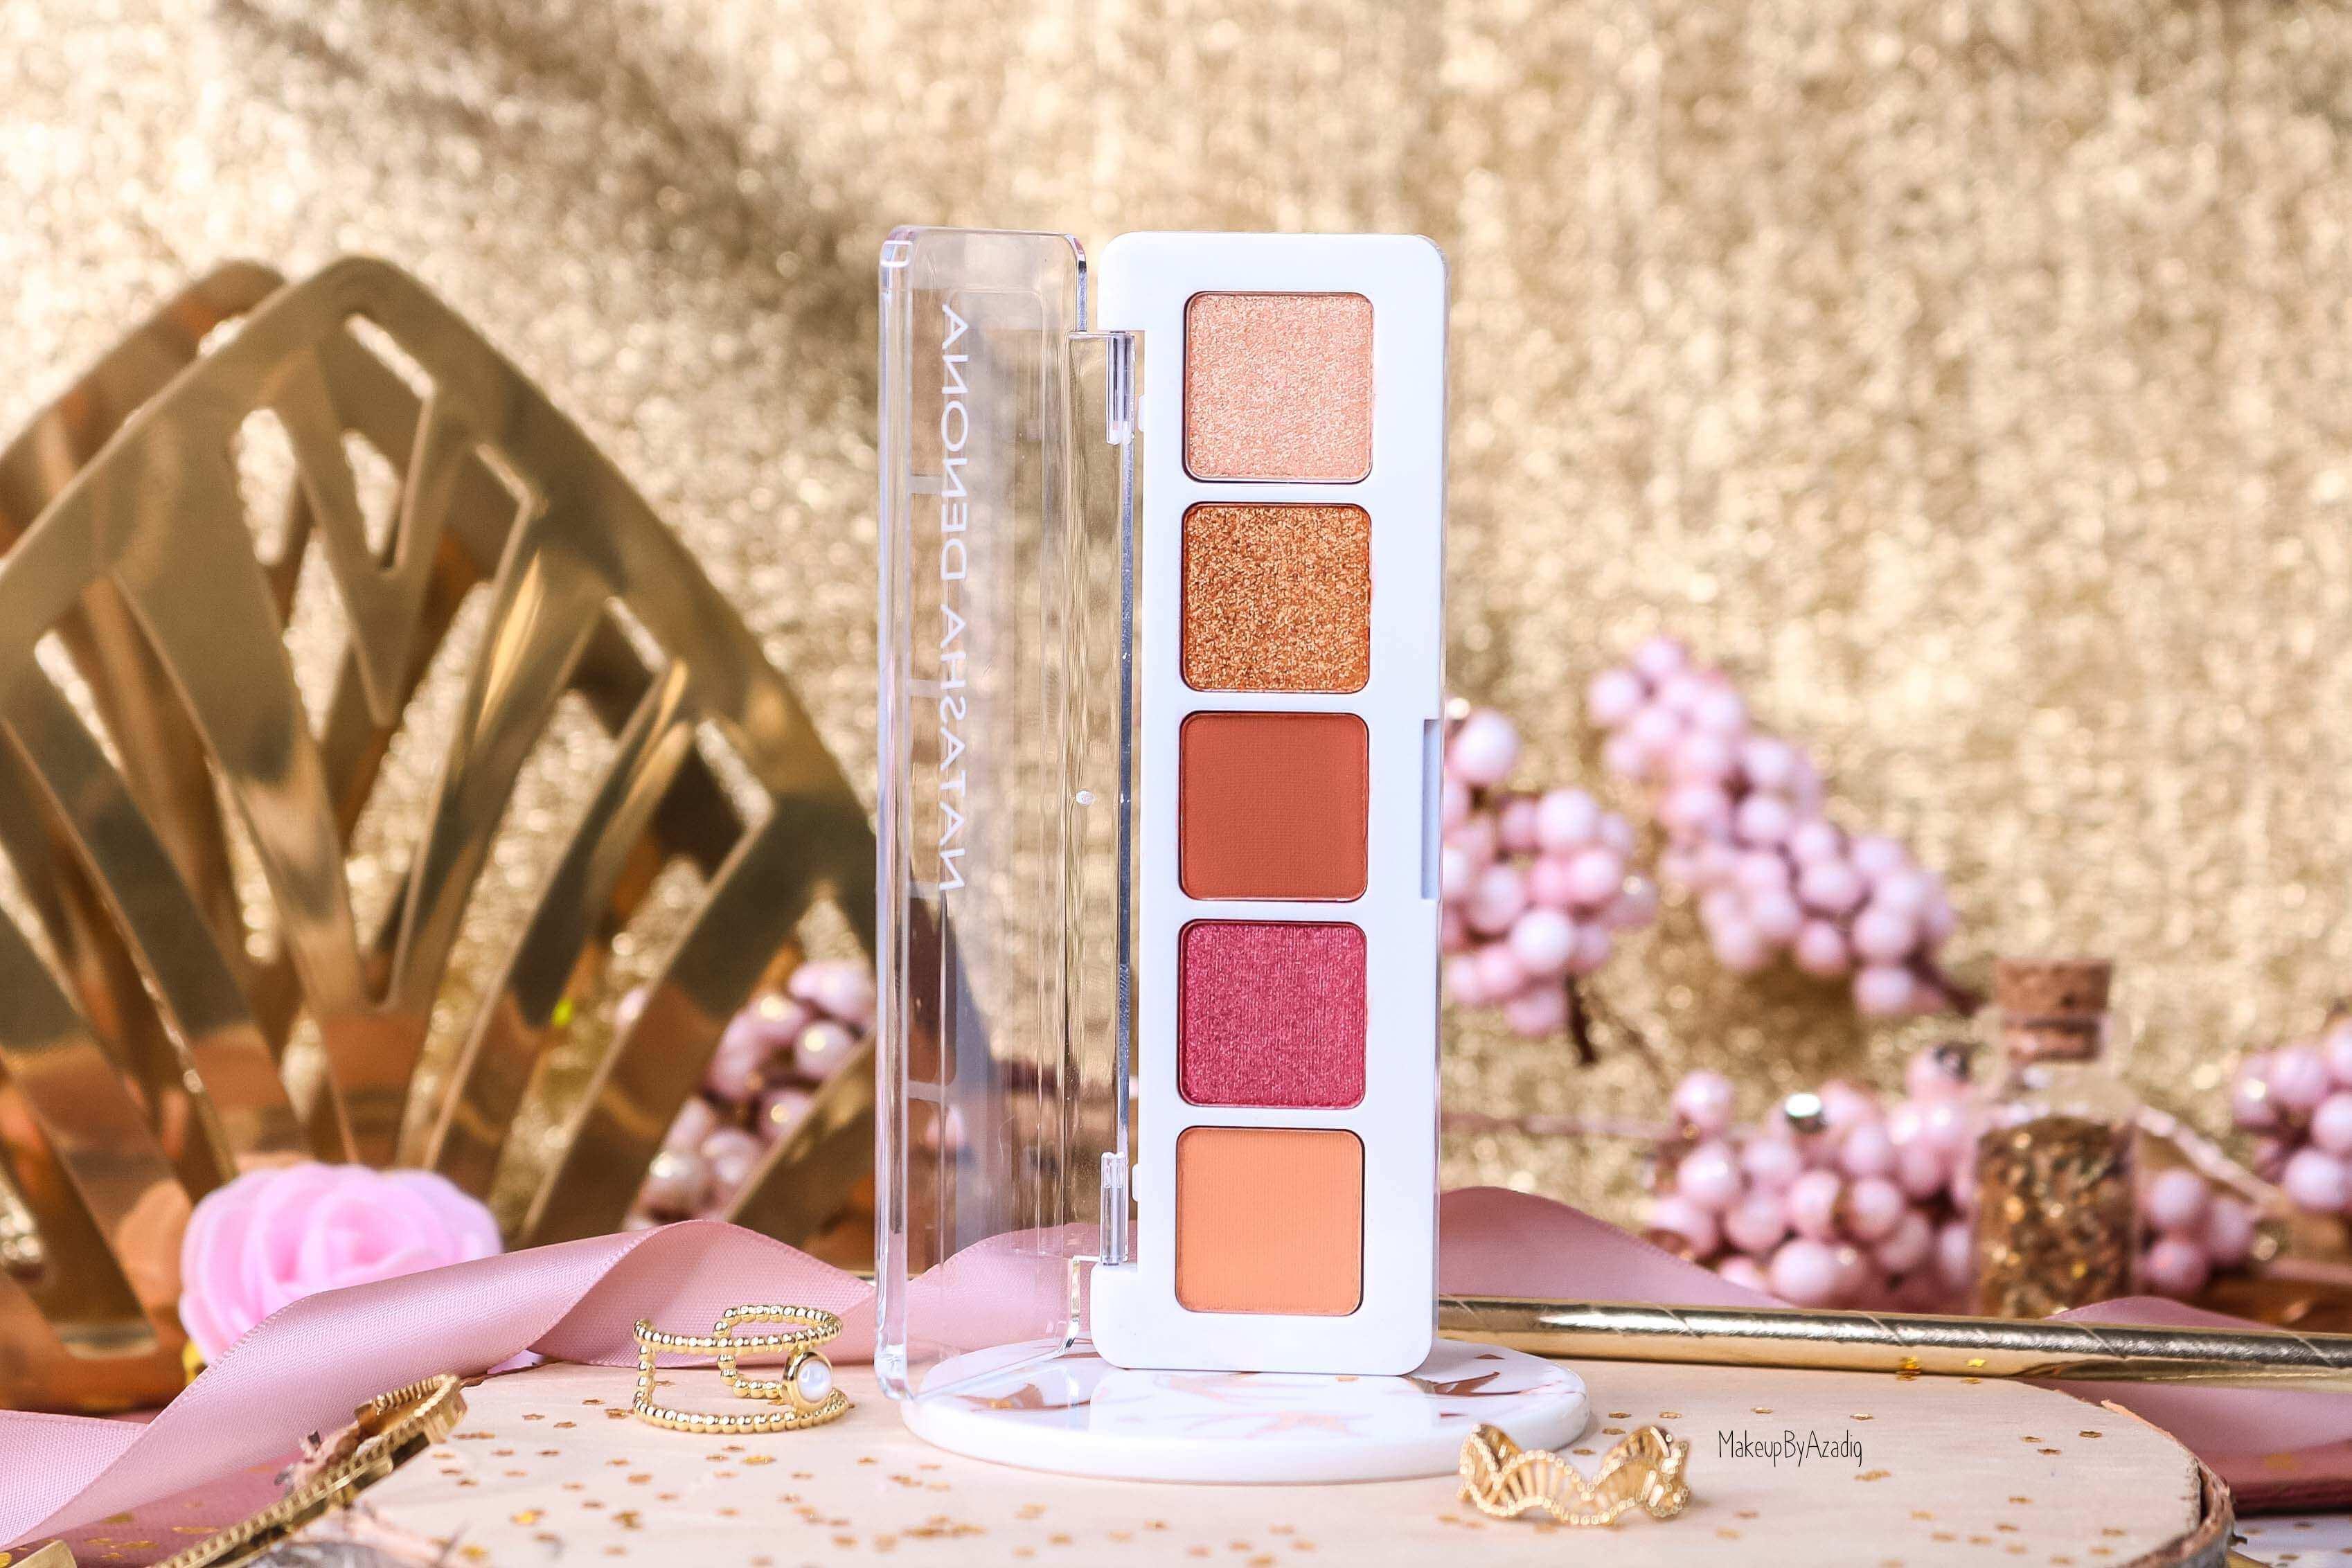 revue-palette-mini-sunset-natasha-denona-sephora-france-avis-prix-swatch-gold-champagne-burgundy-makeupbyazadig-eyeshadow-dore